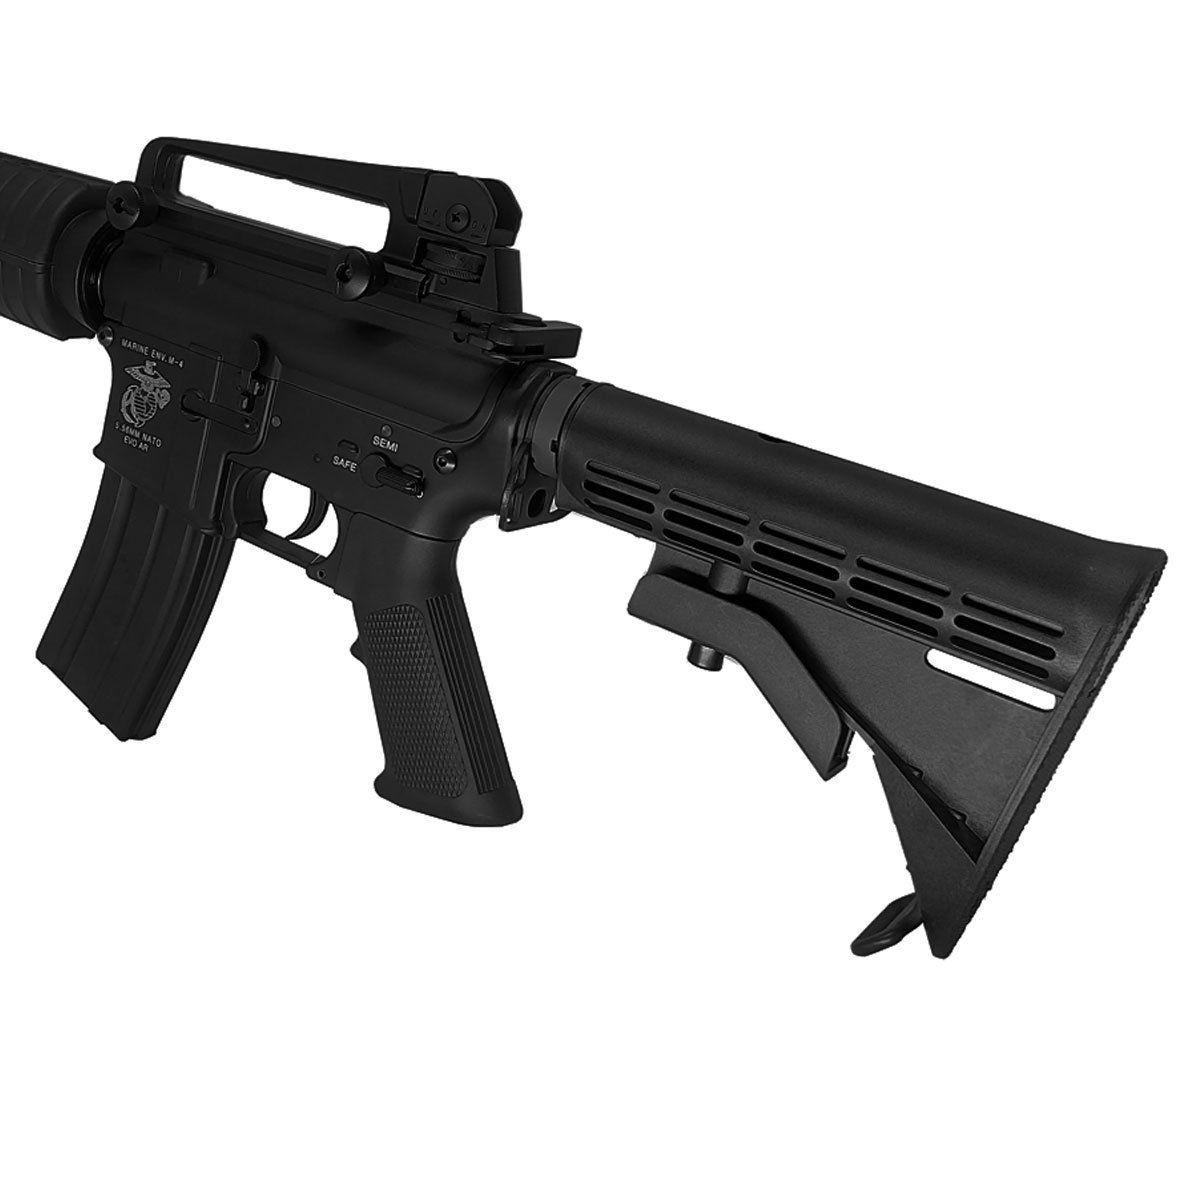 Rifle de Airsoft Evo M4A1 Carbine Elétrico 6mm